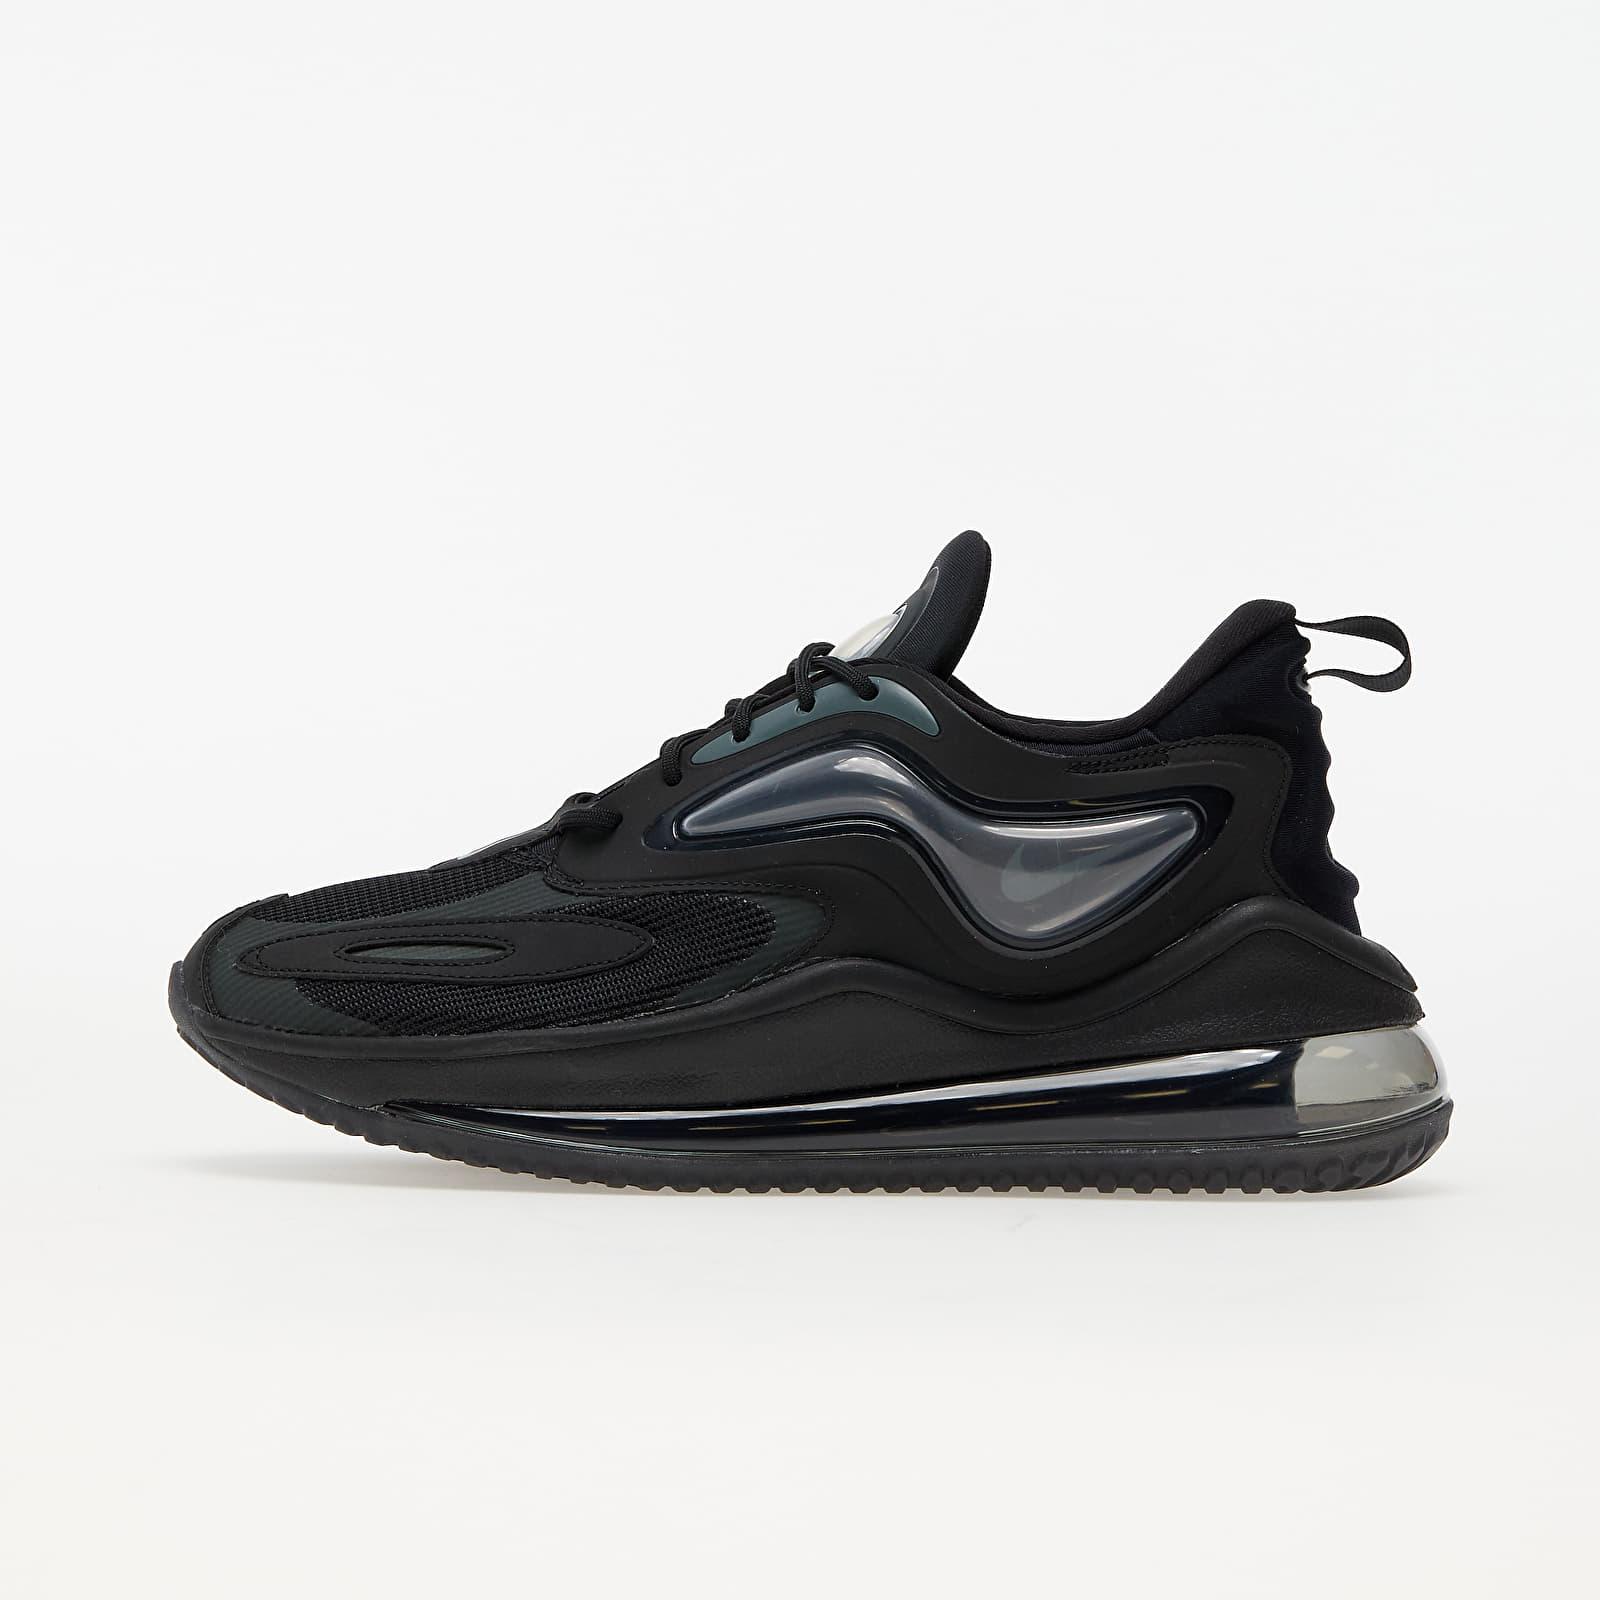 Nike Air Max Zephyr Black/ Dk Smoke Grey CV8837-002